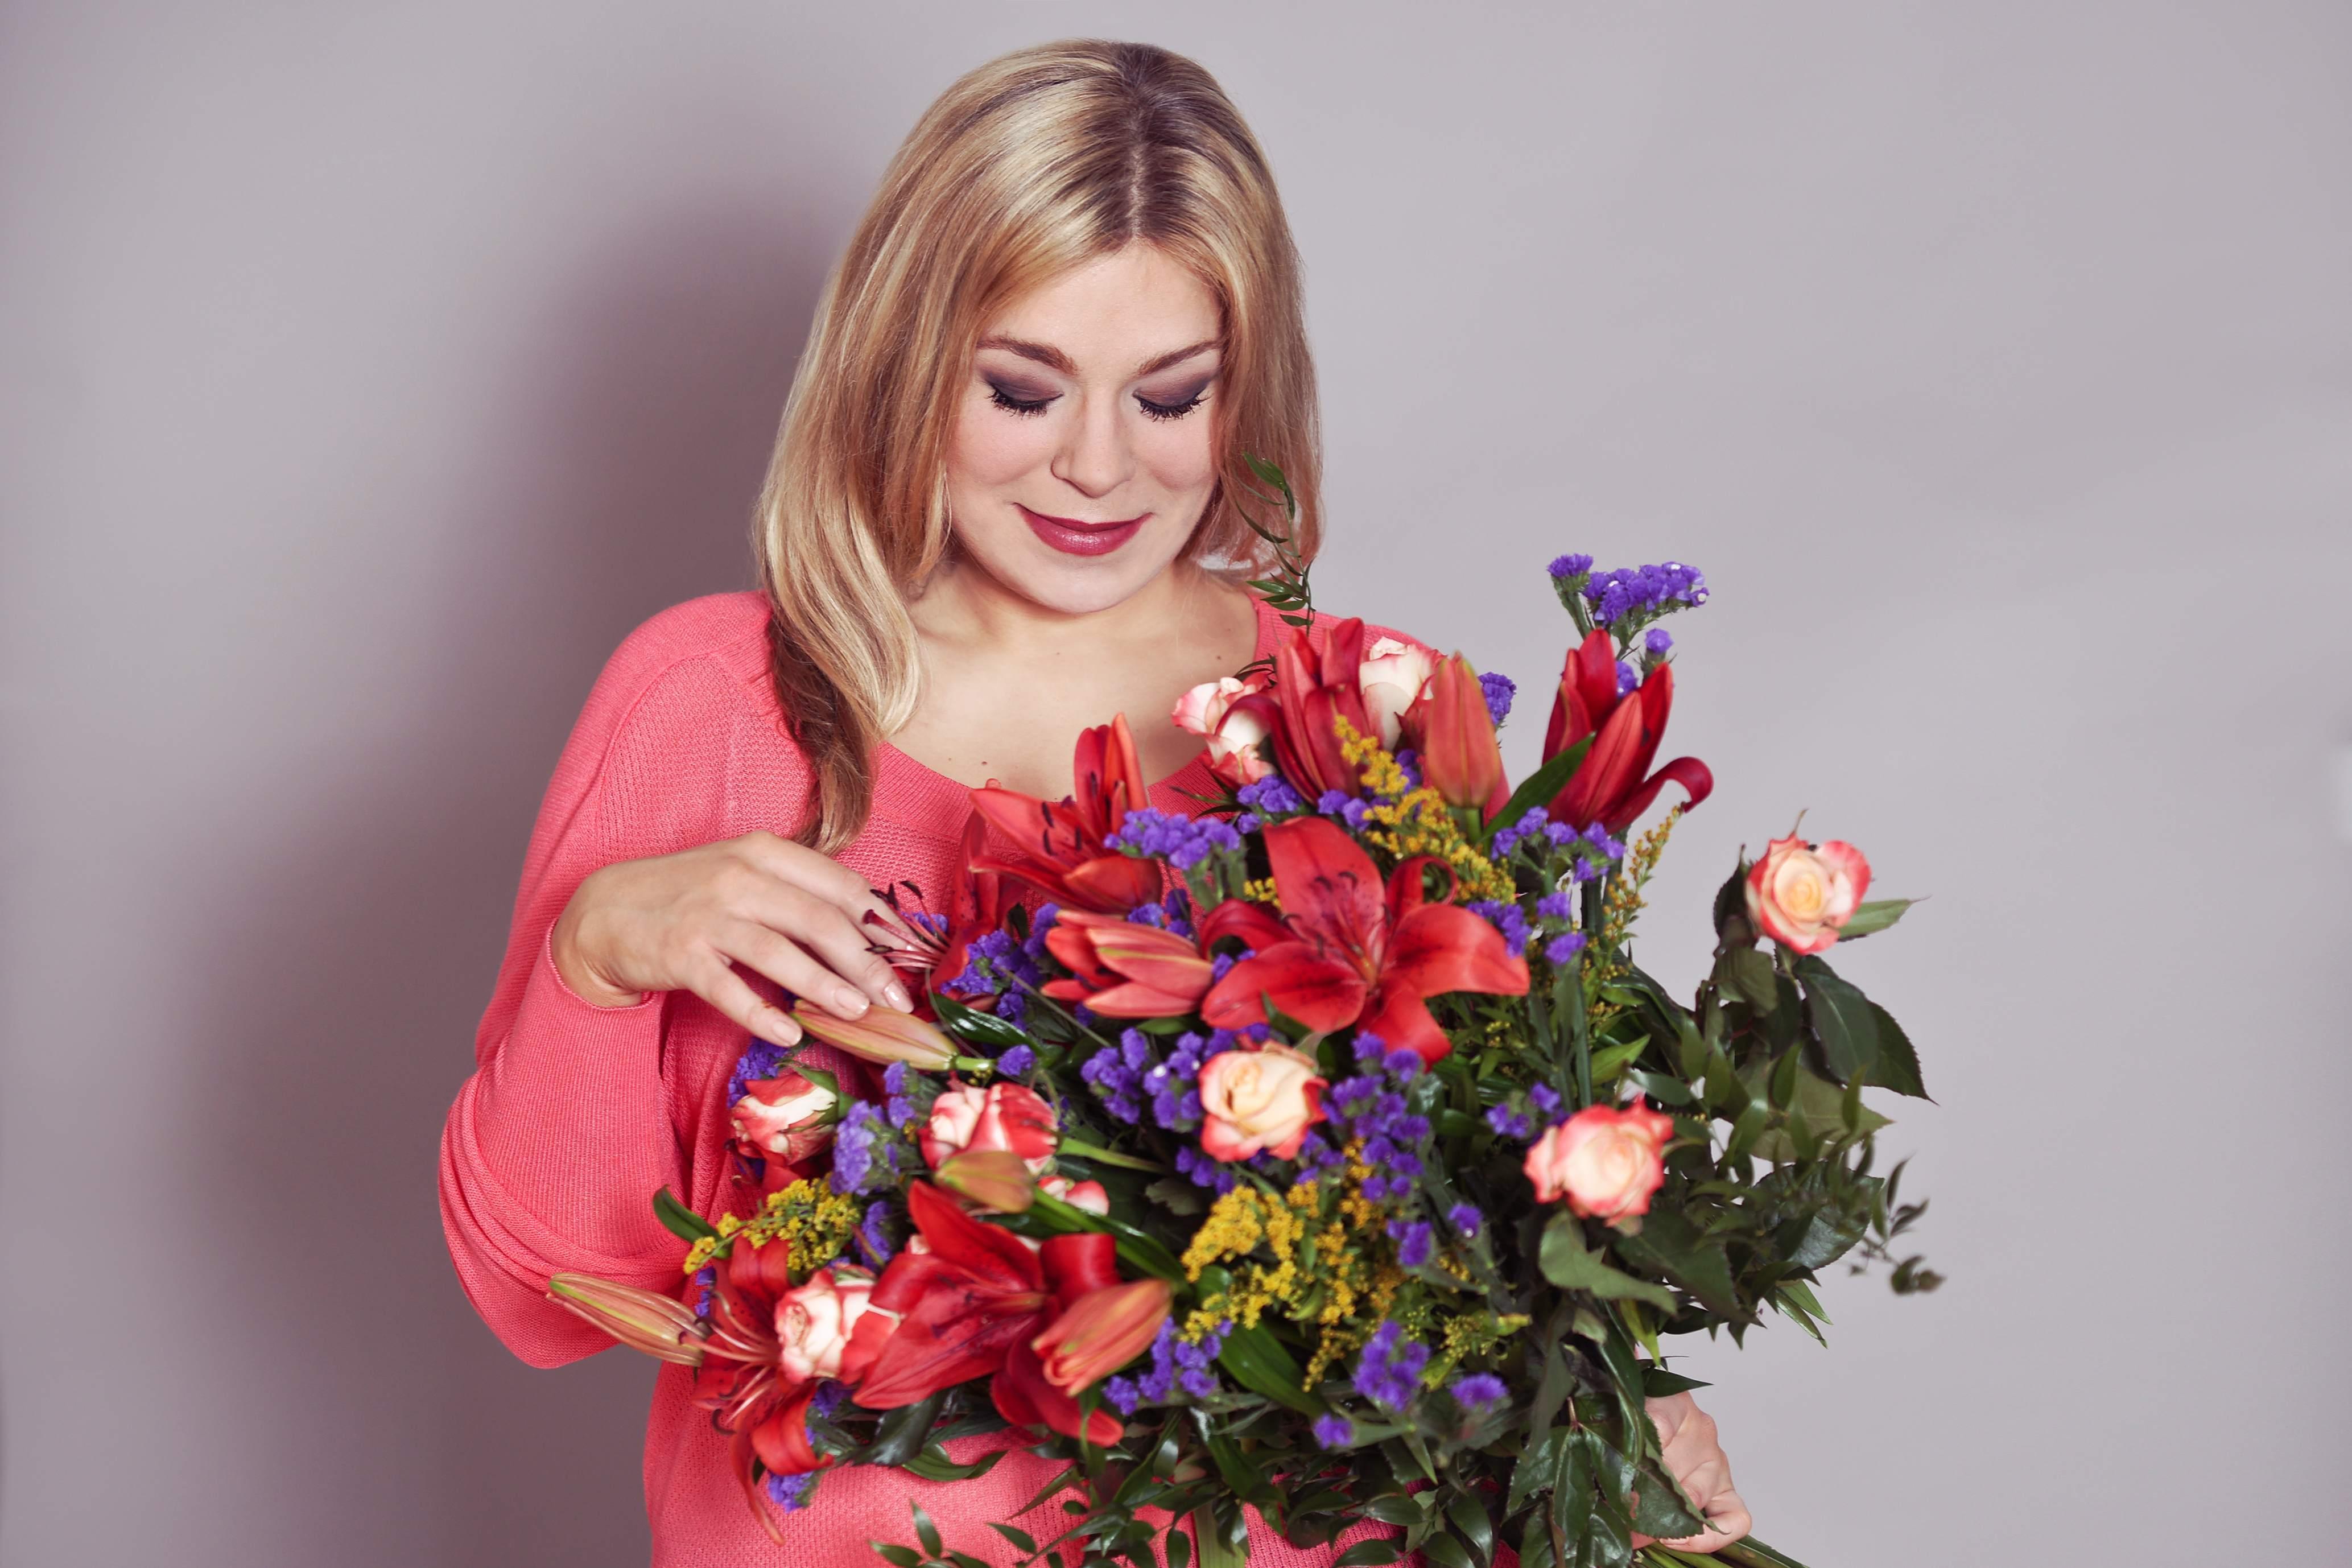 Megabambi-plussizeblogger-Plussize-curvy-model-Caterina-pogorzelski